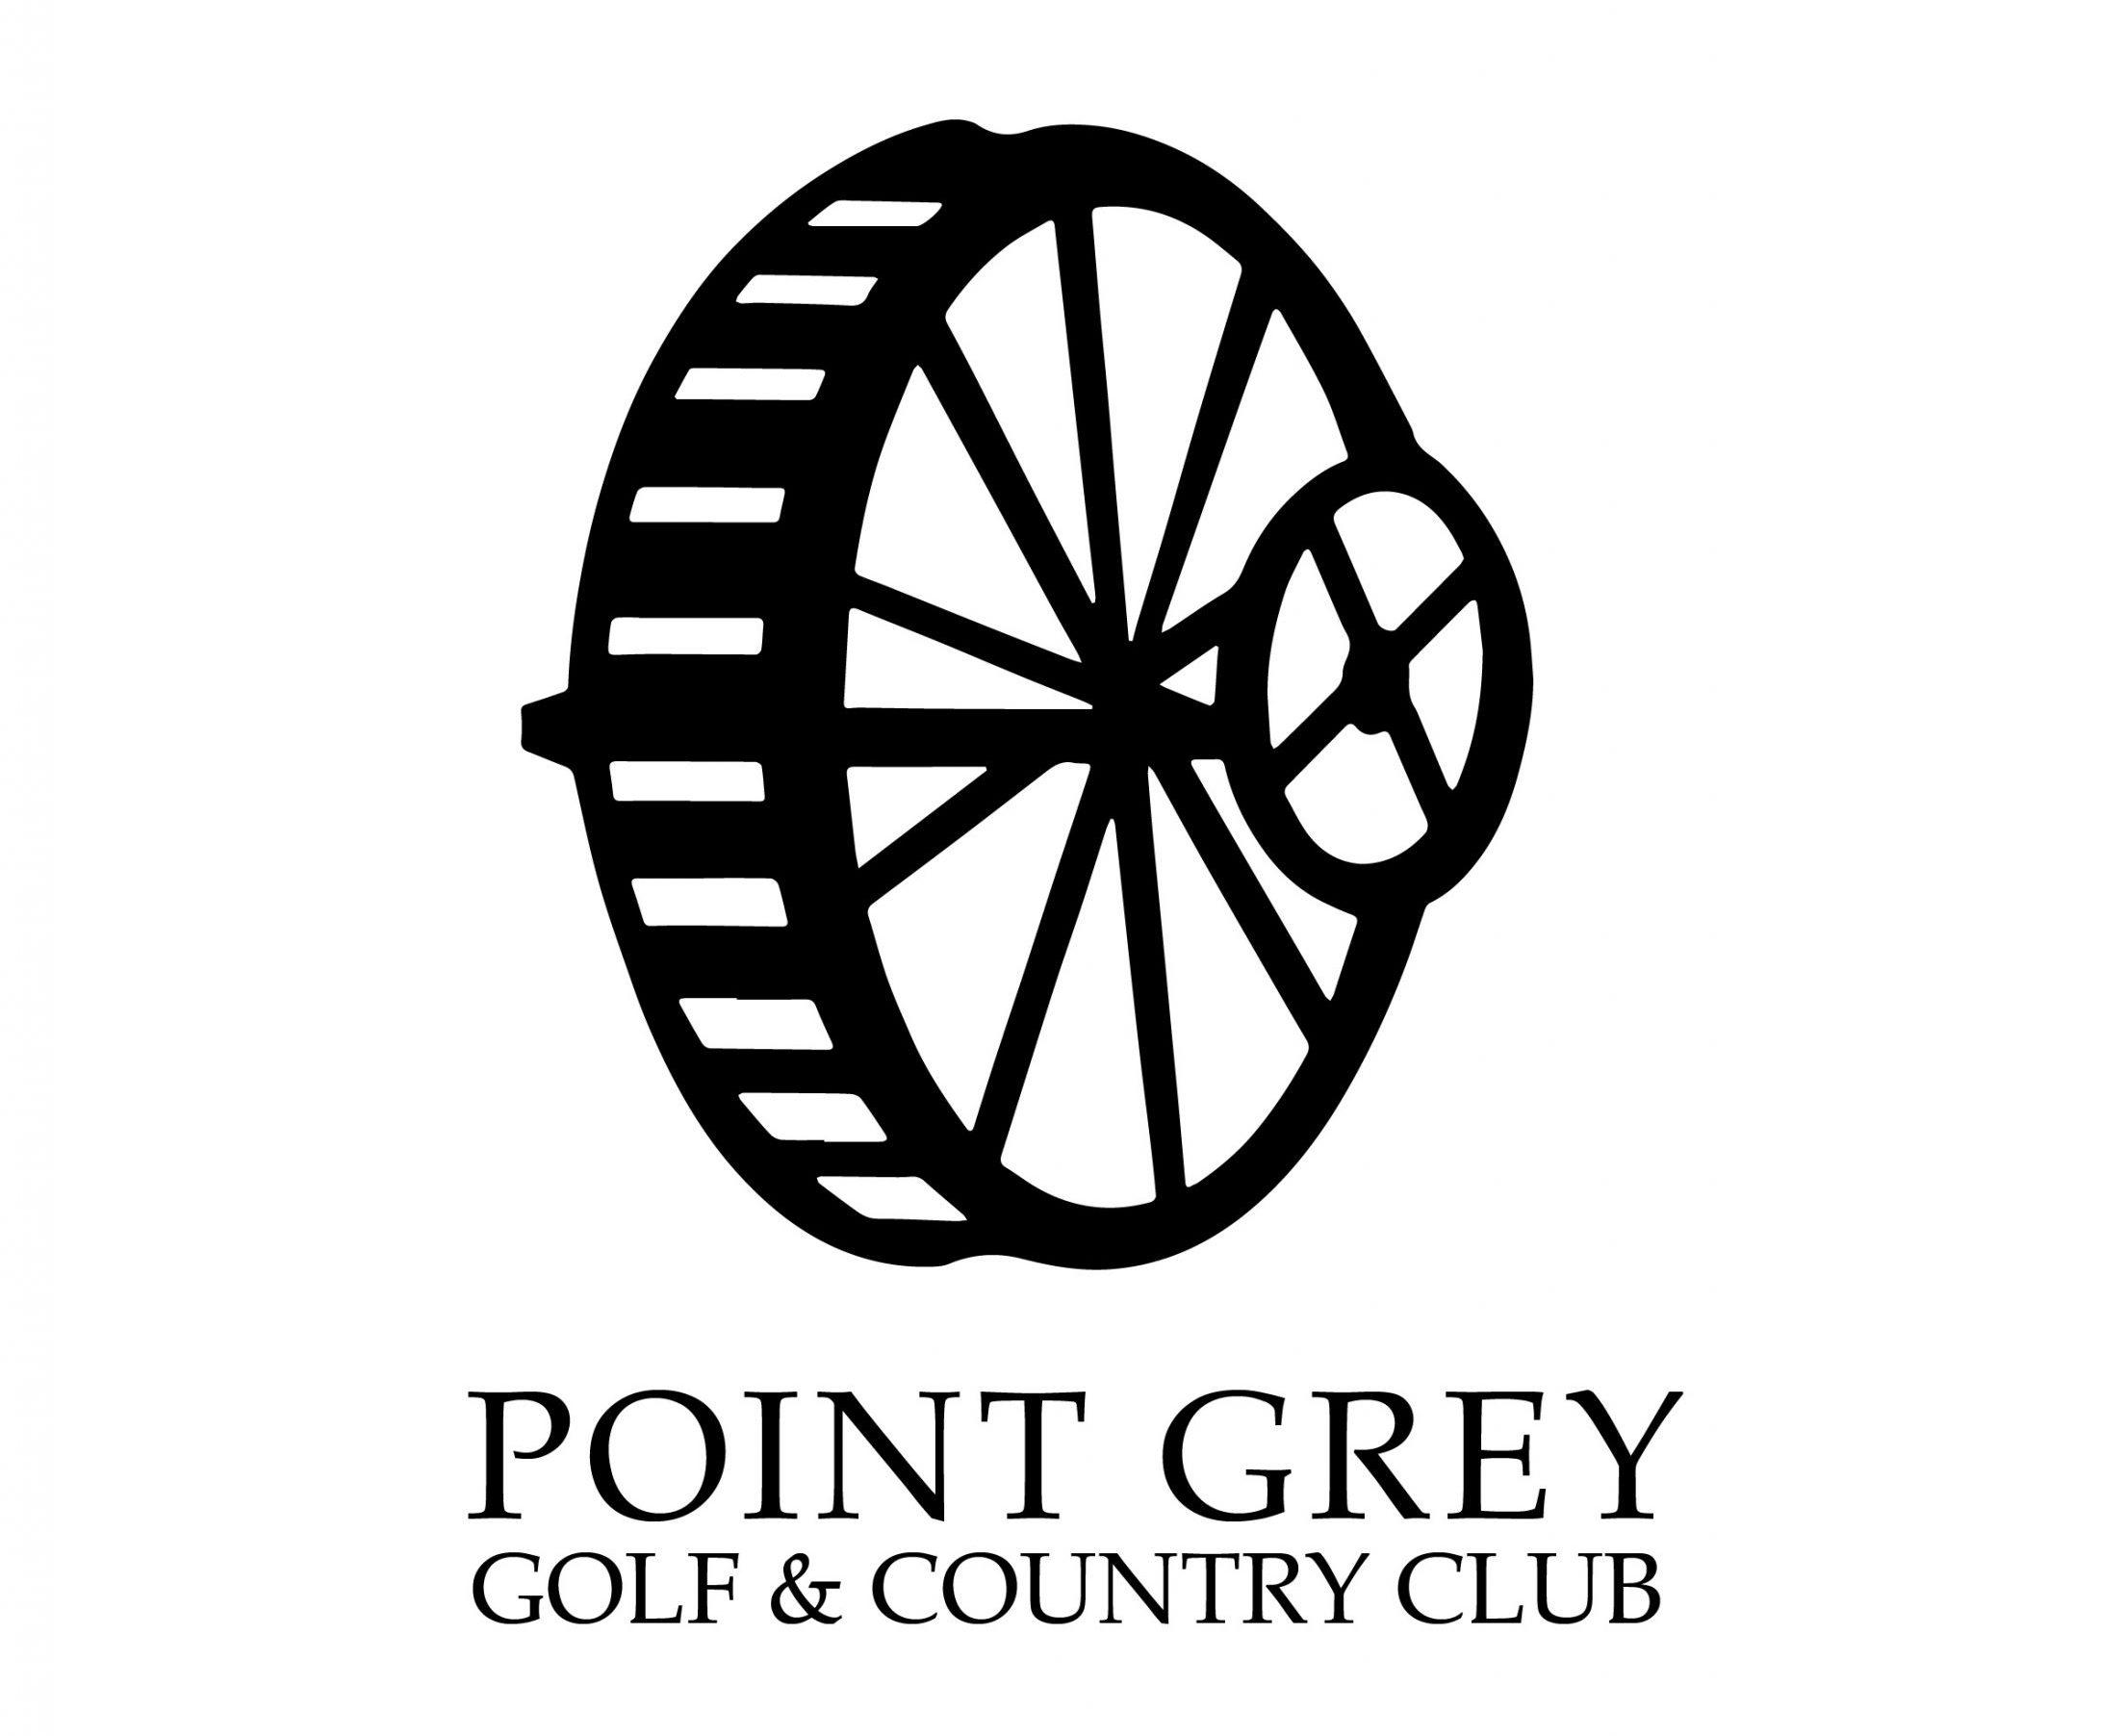 Point Grey Golf & Country Club